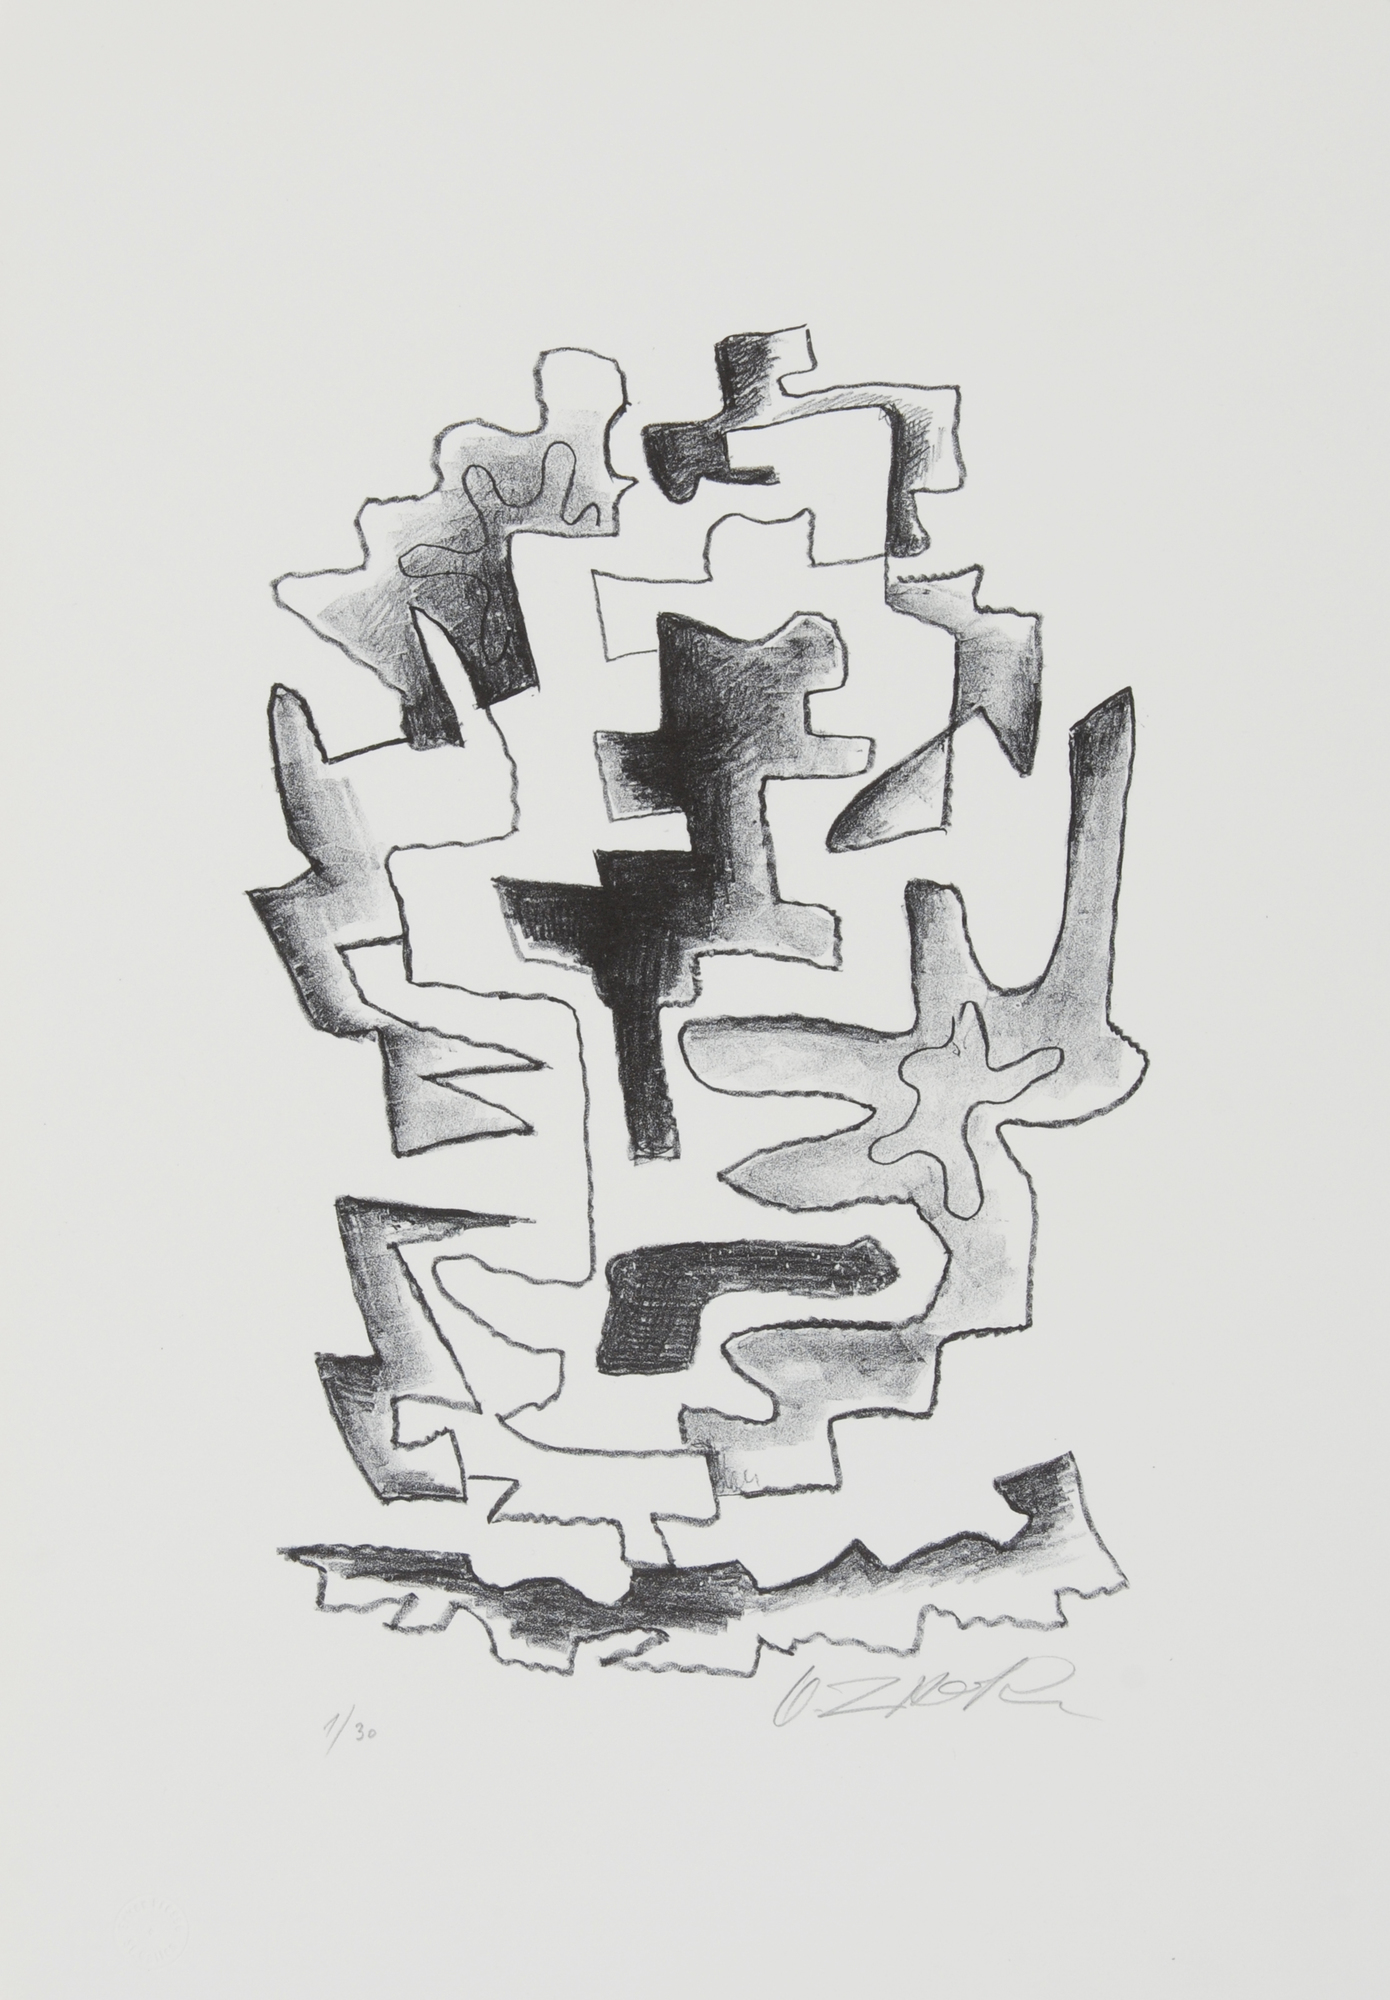 Zadkine Ossip, 2 Blätter: L'inspire, 1961; Le noir souriant